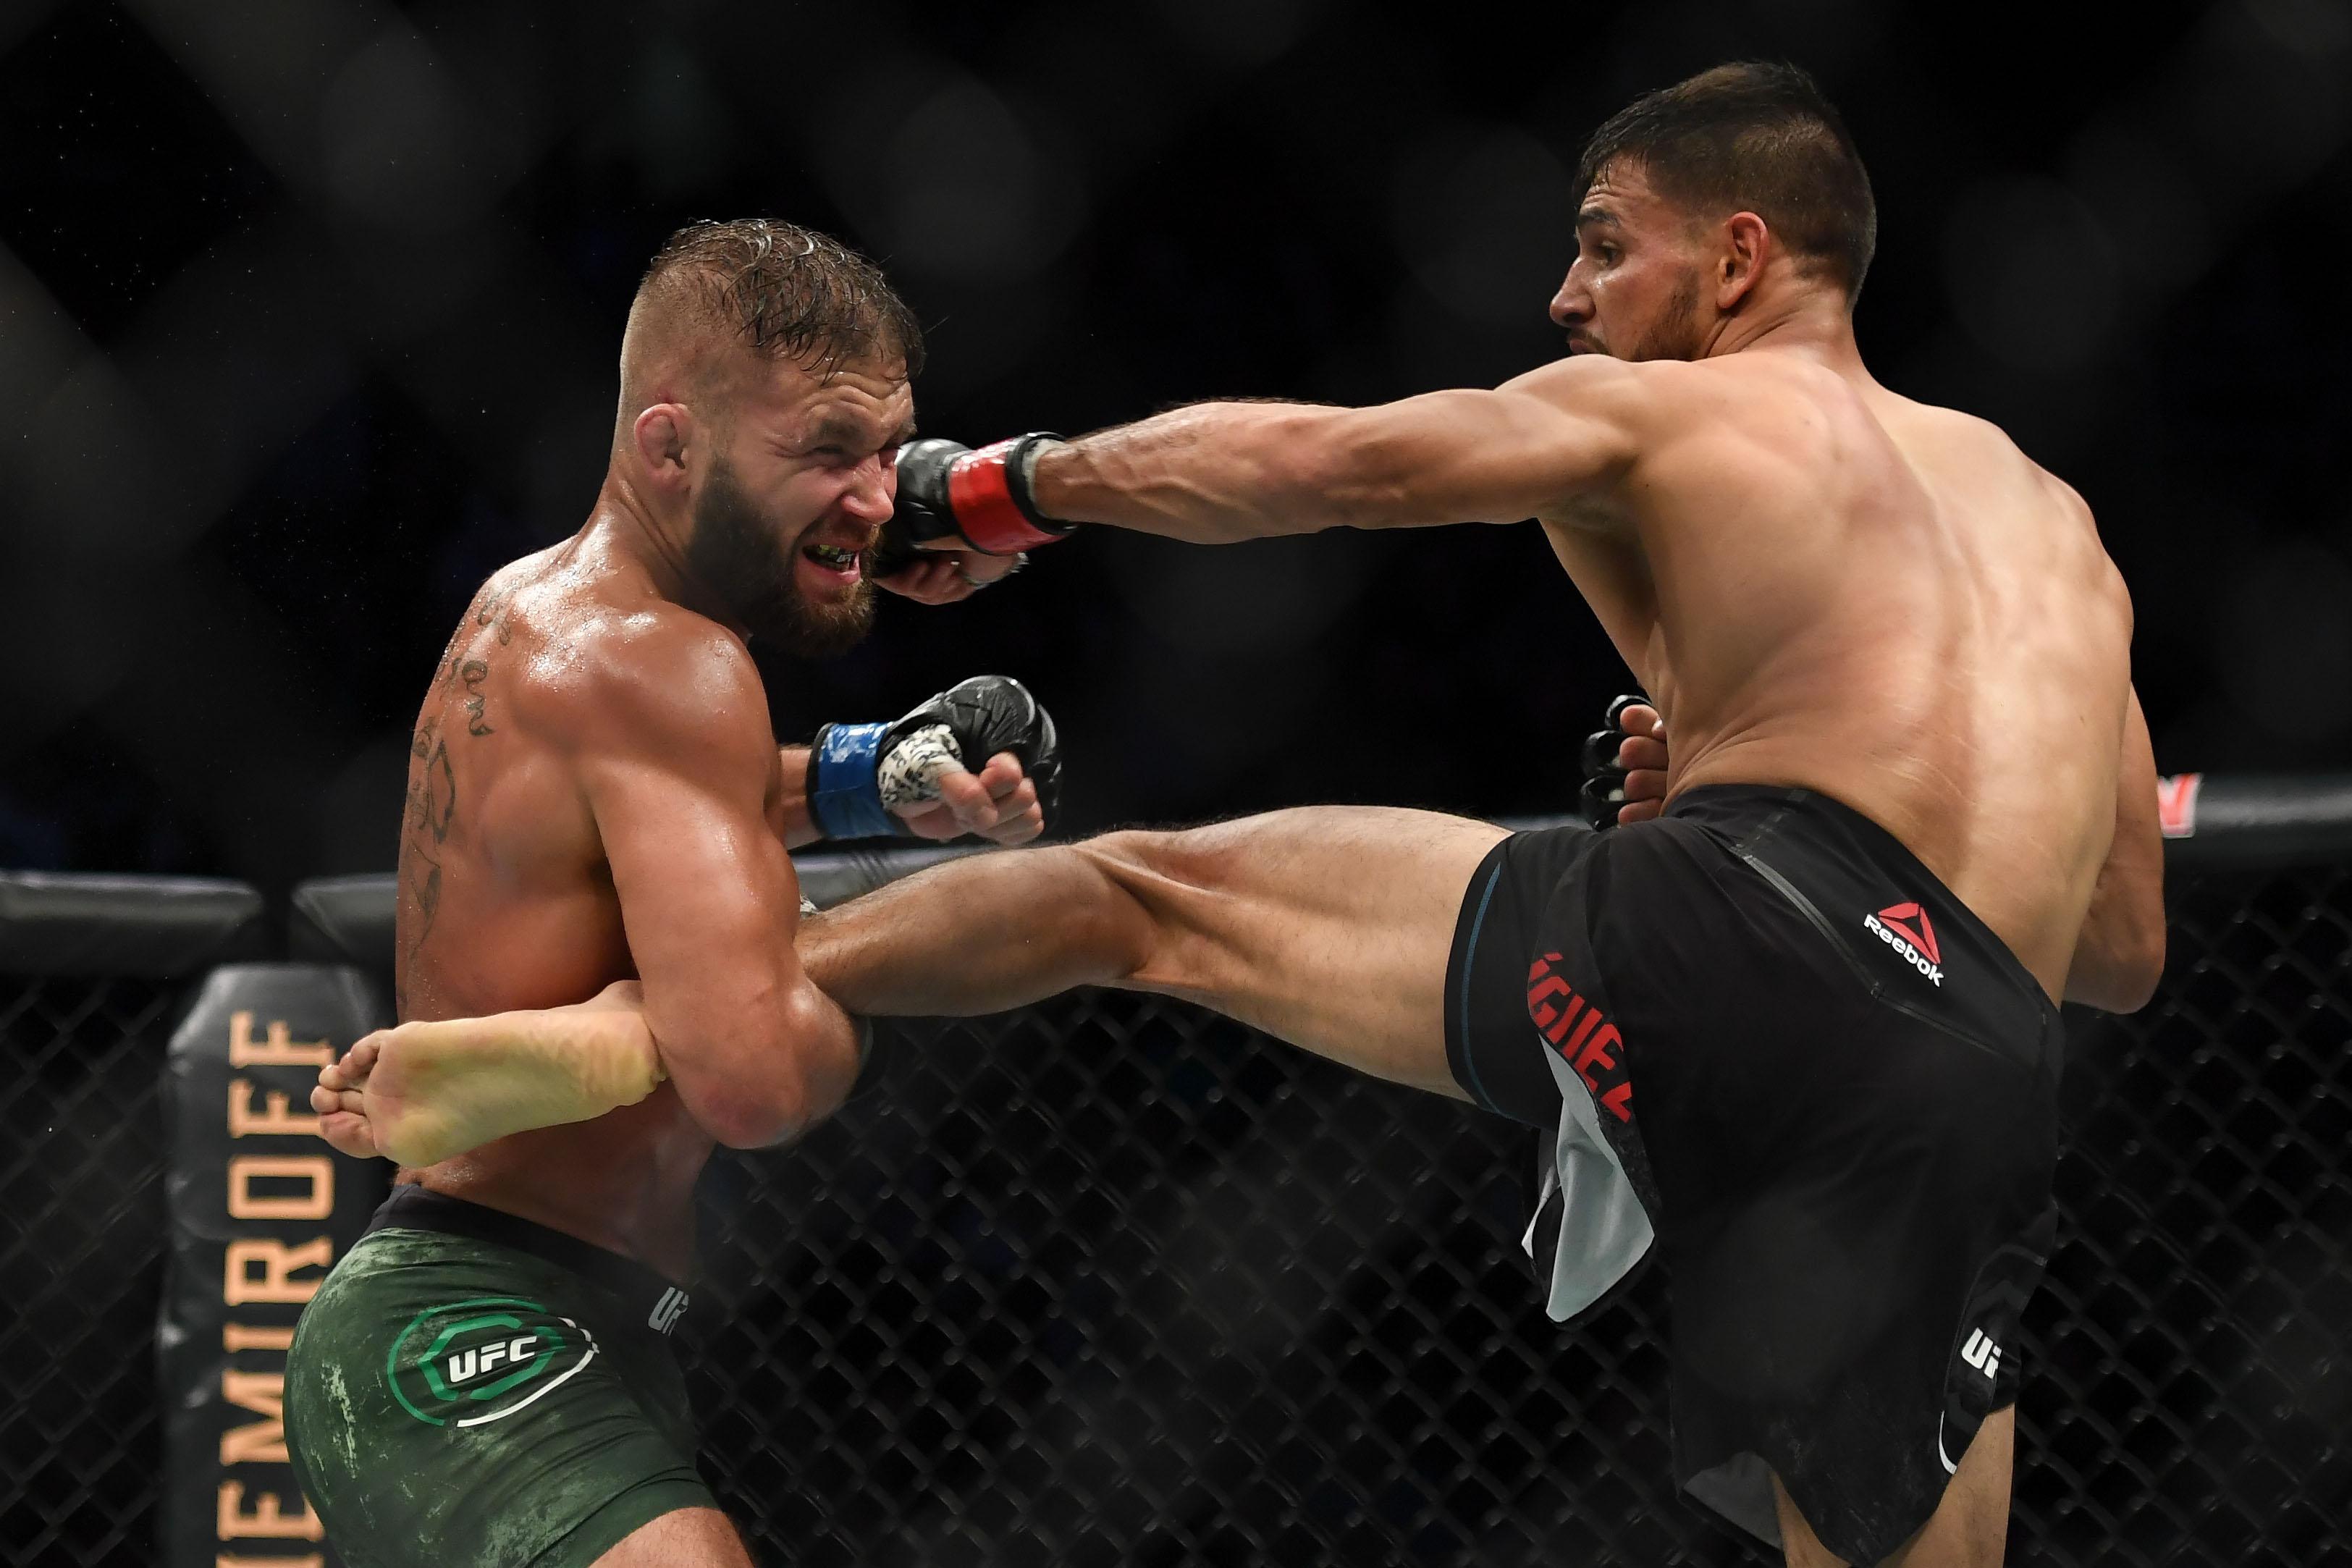 MMA: UFC Fight Night-Boston-Rodriguez vs Stephens